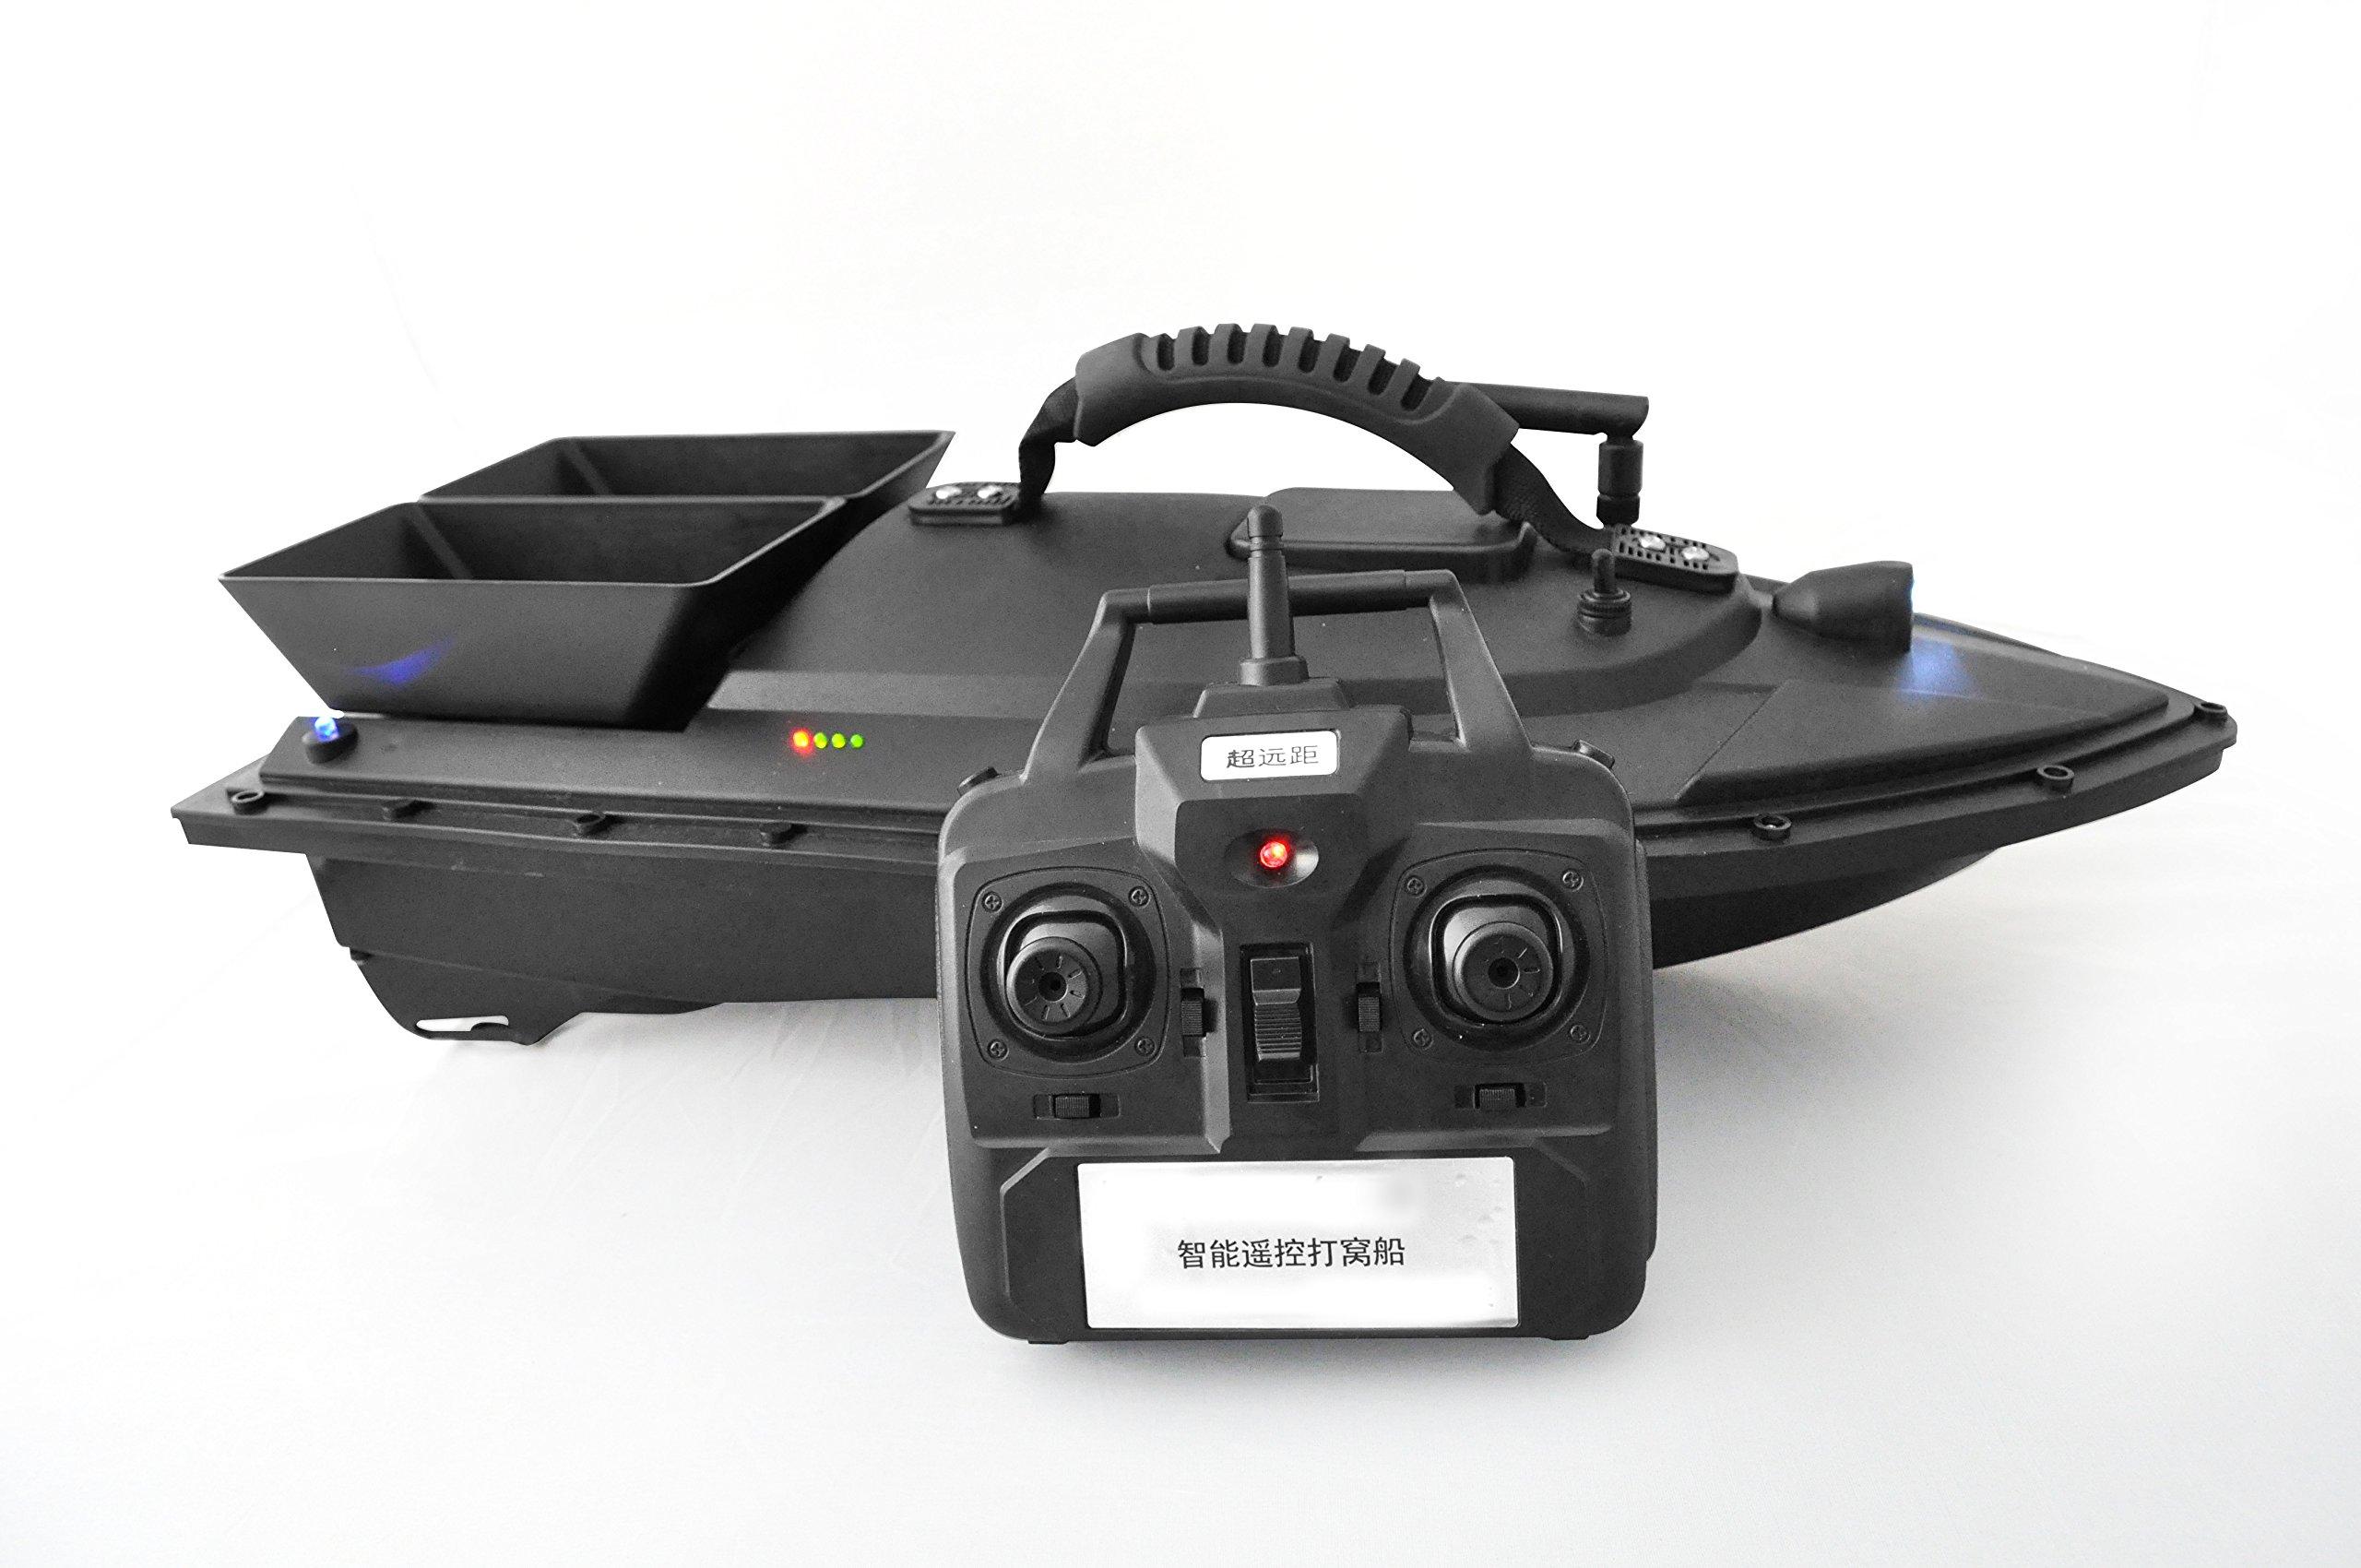 YARUIFANSEN Wireless RC Fishing Nest Lure Radio Bait Boat